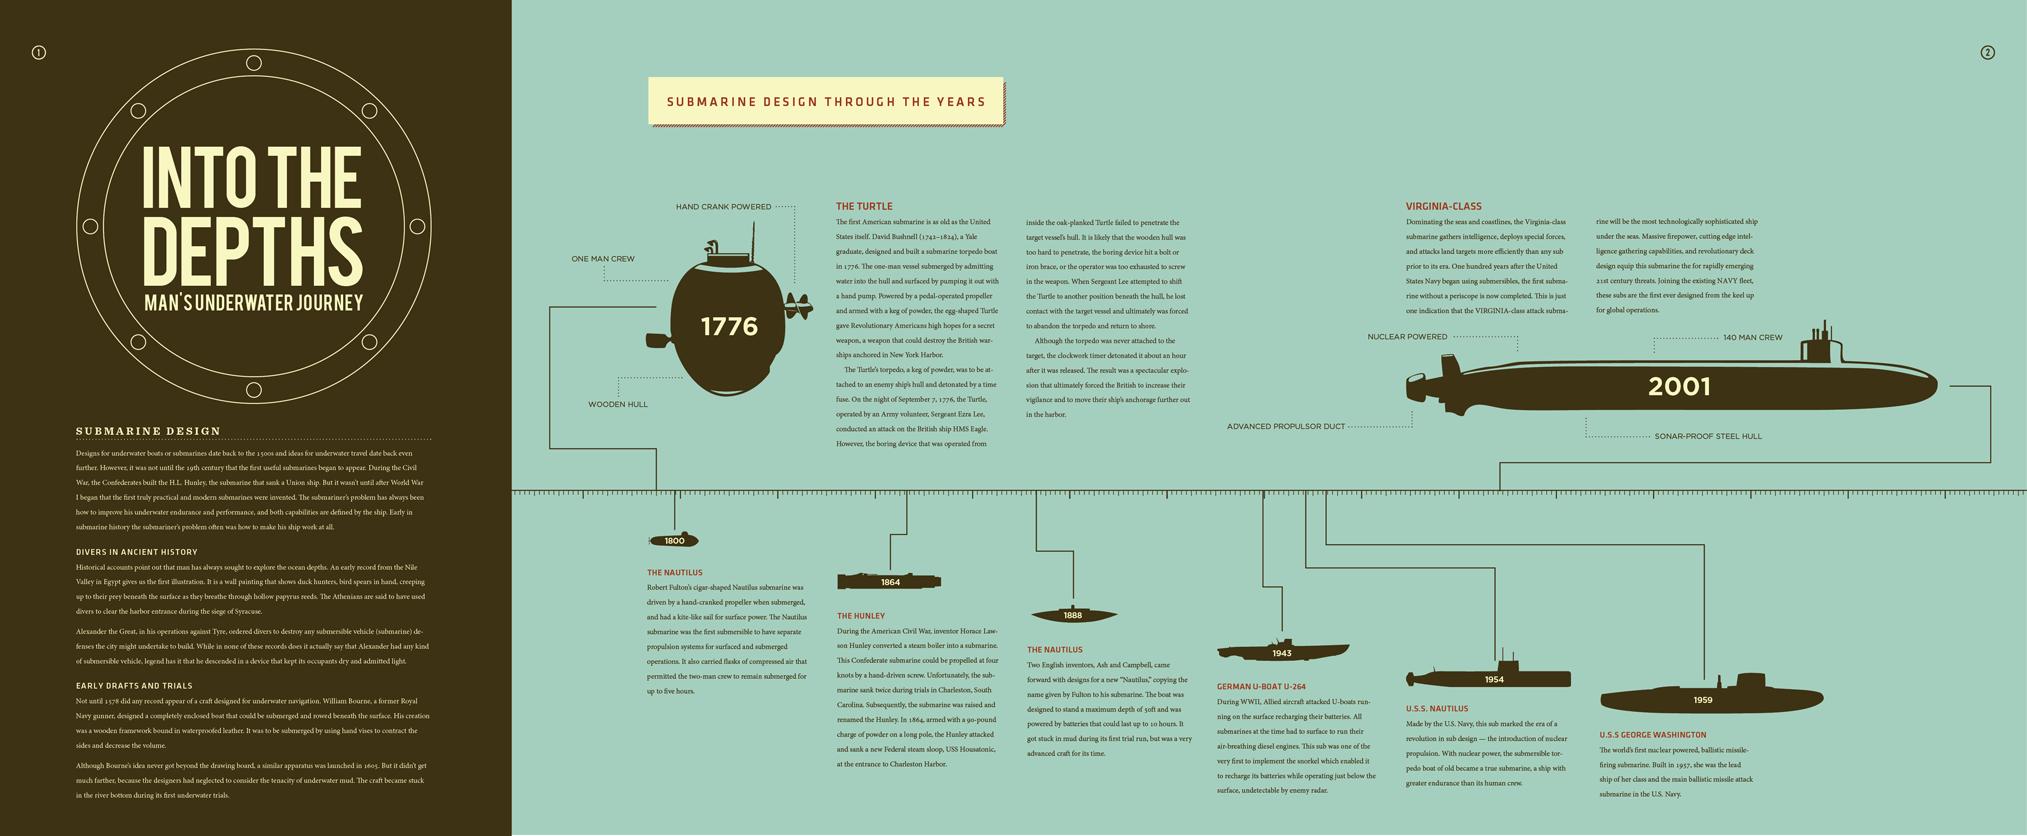 Submarine Infographic by Mac Tyler http://dribbble.com/shots/79196-Completed-Submarine-Infographic